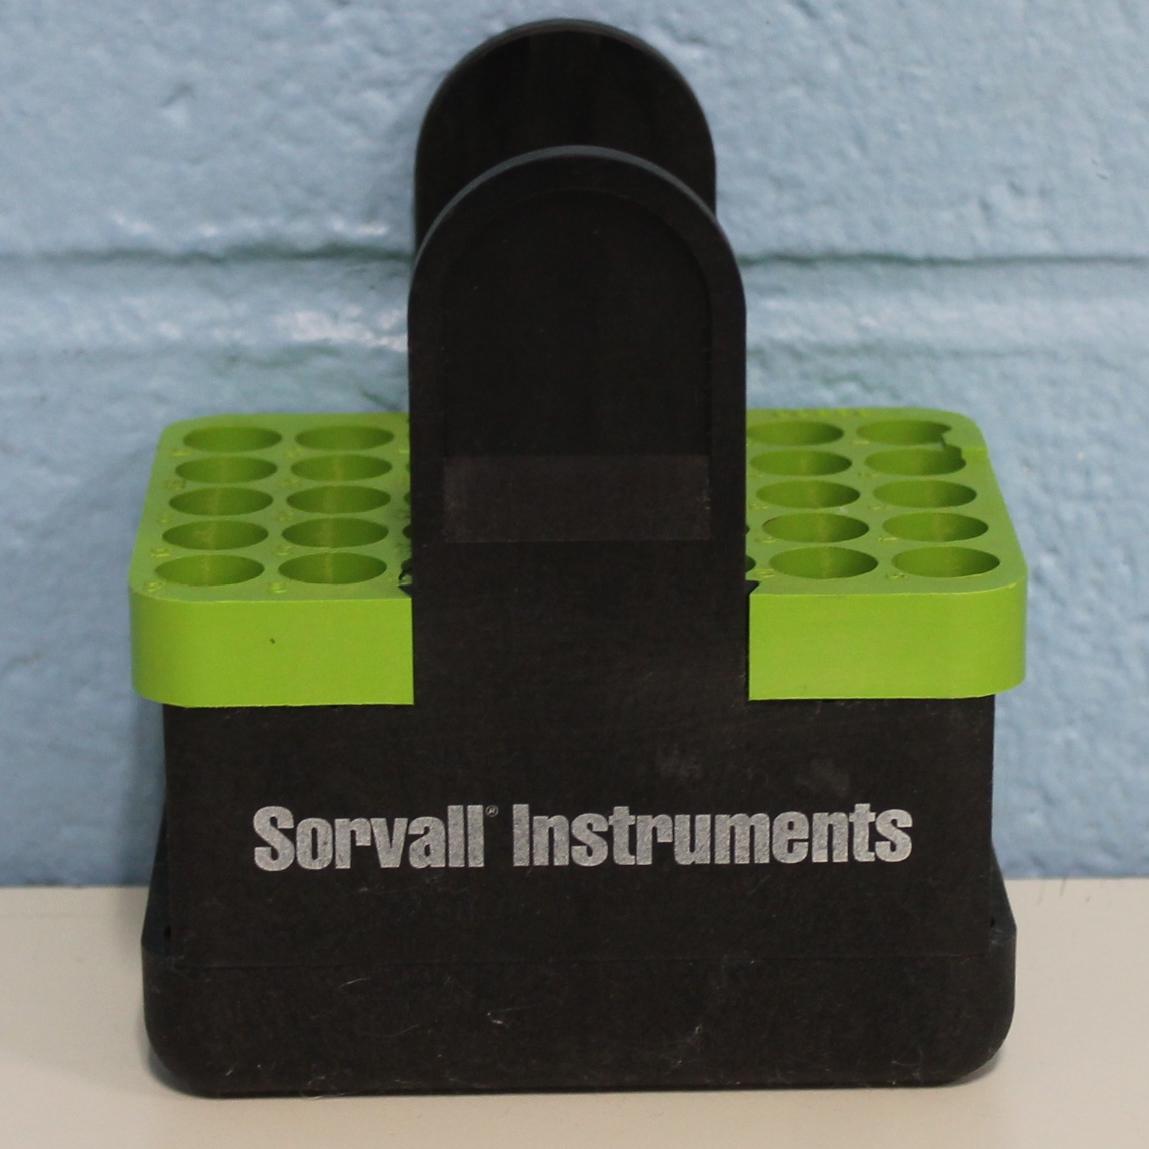 Sorvall 00836 Swing Bucket Adapters Image